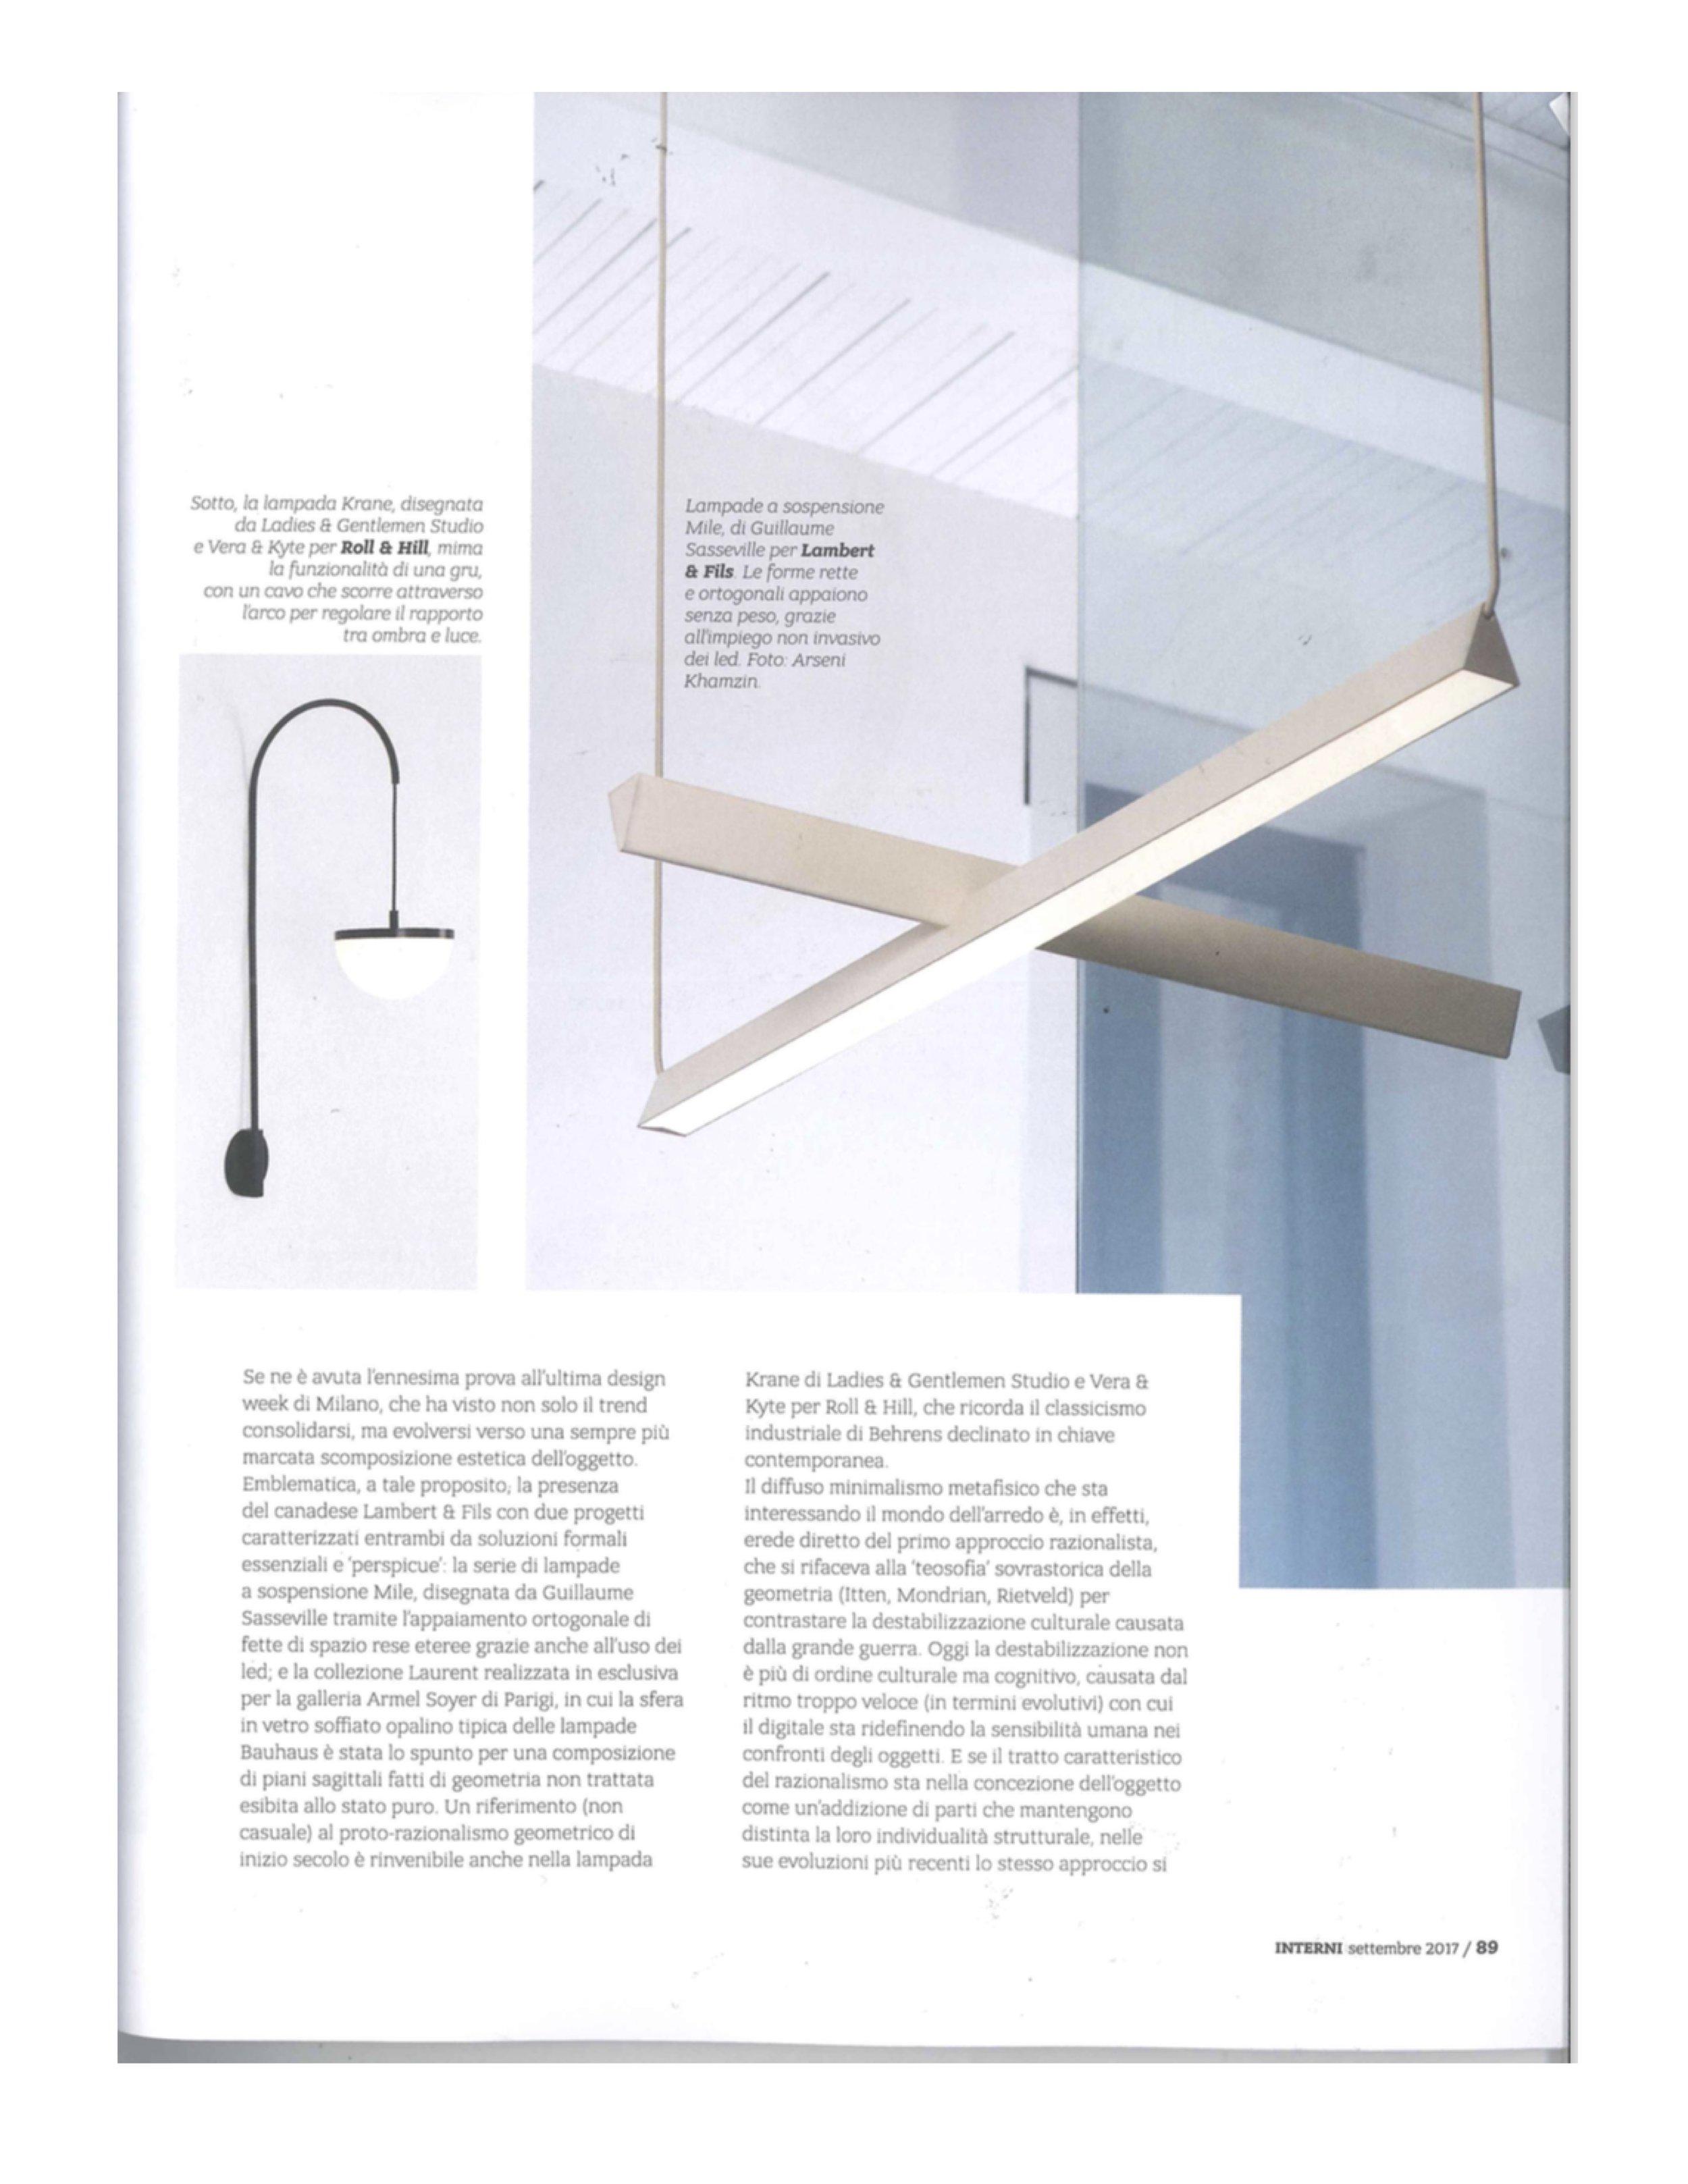 Lampada Da Studio Design interni / sep / 2017 — l & g studio